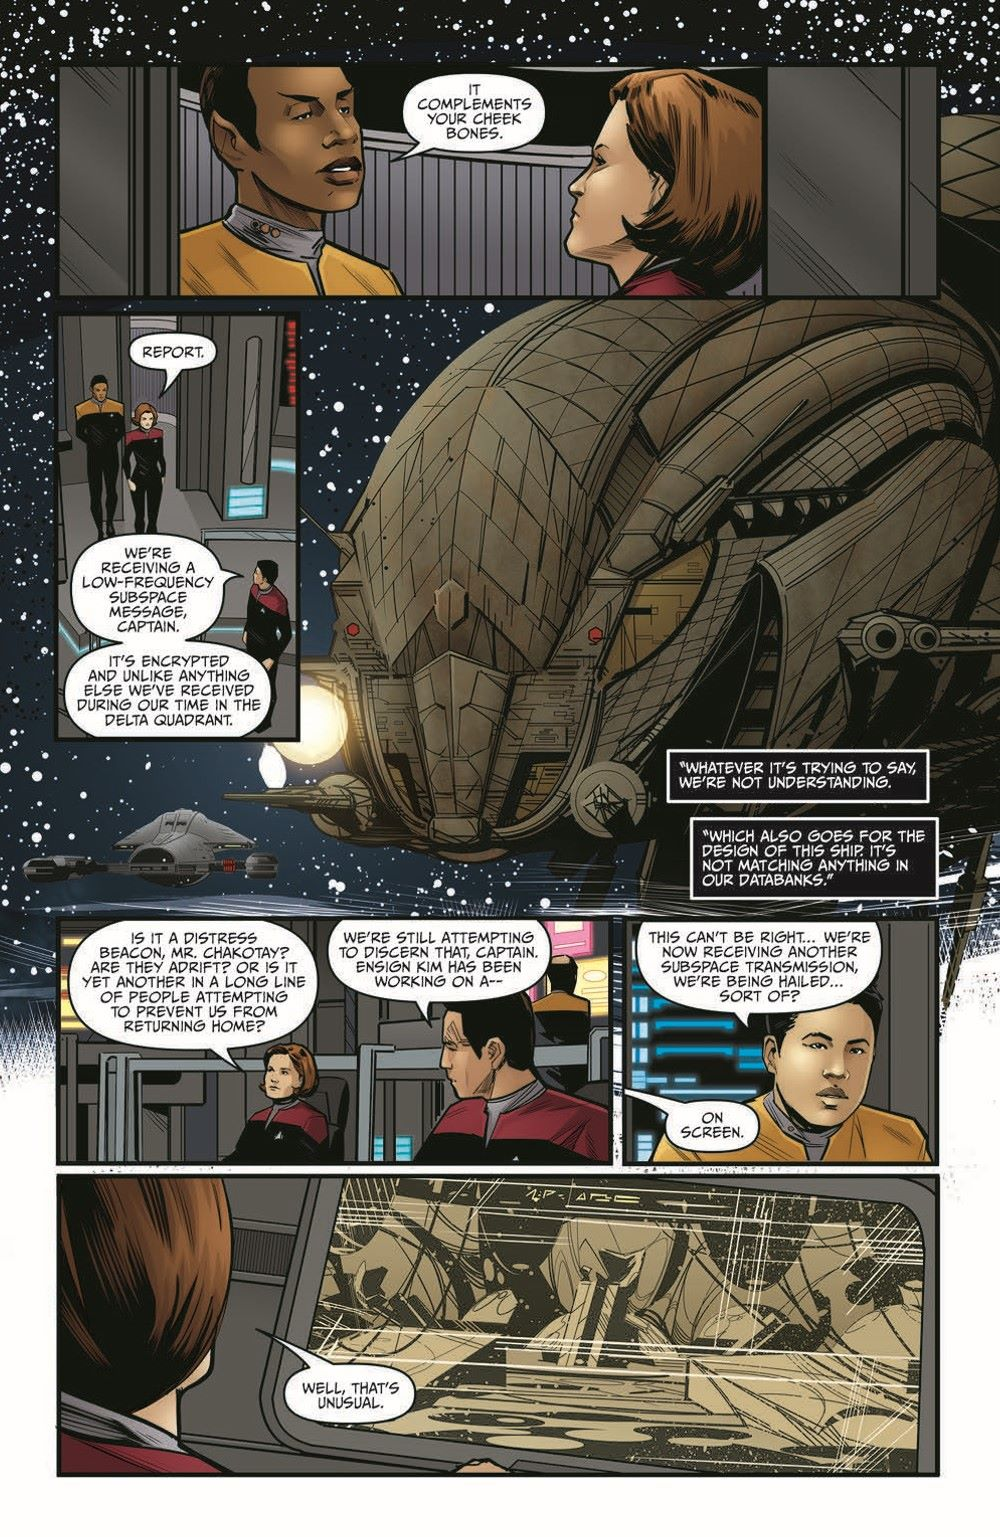 ST_Voyager_SR01-pr-7 ComicList Previews: STAR TREK VOYAGER SEVEN'S RECKONING #1 (OF 4)